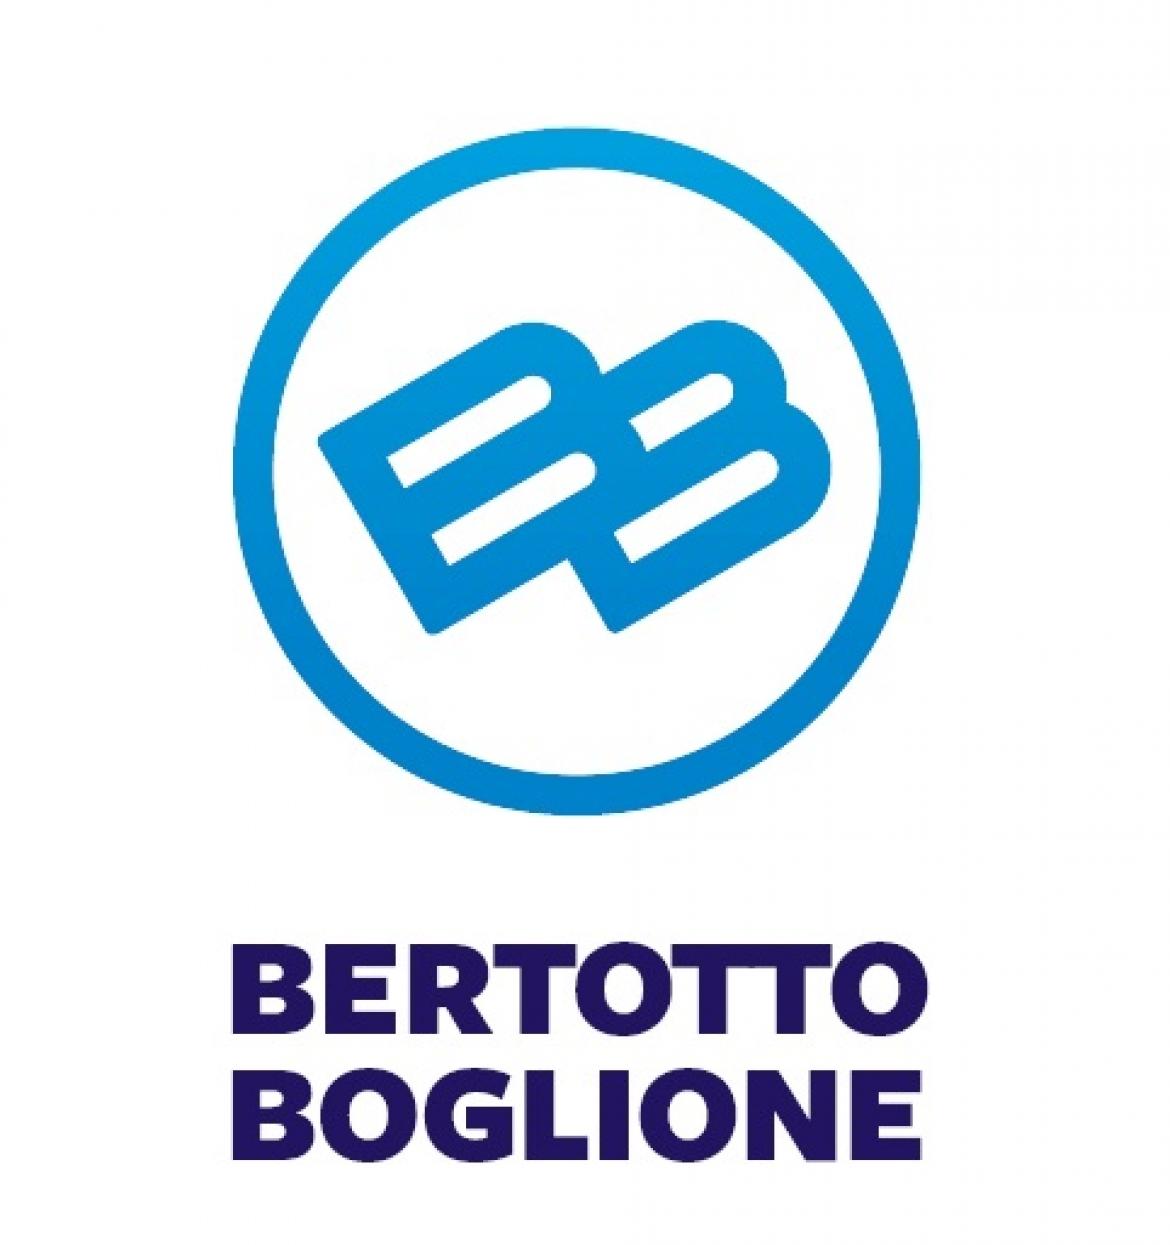 Obligaciones Negociables Pyme CNV Garantizada BERTOTTO BOGLIONE S.A. Serie I